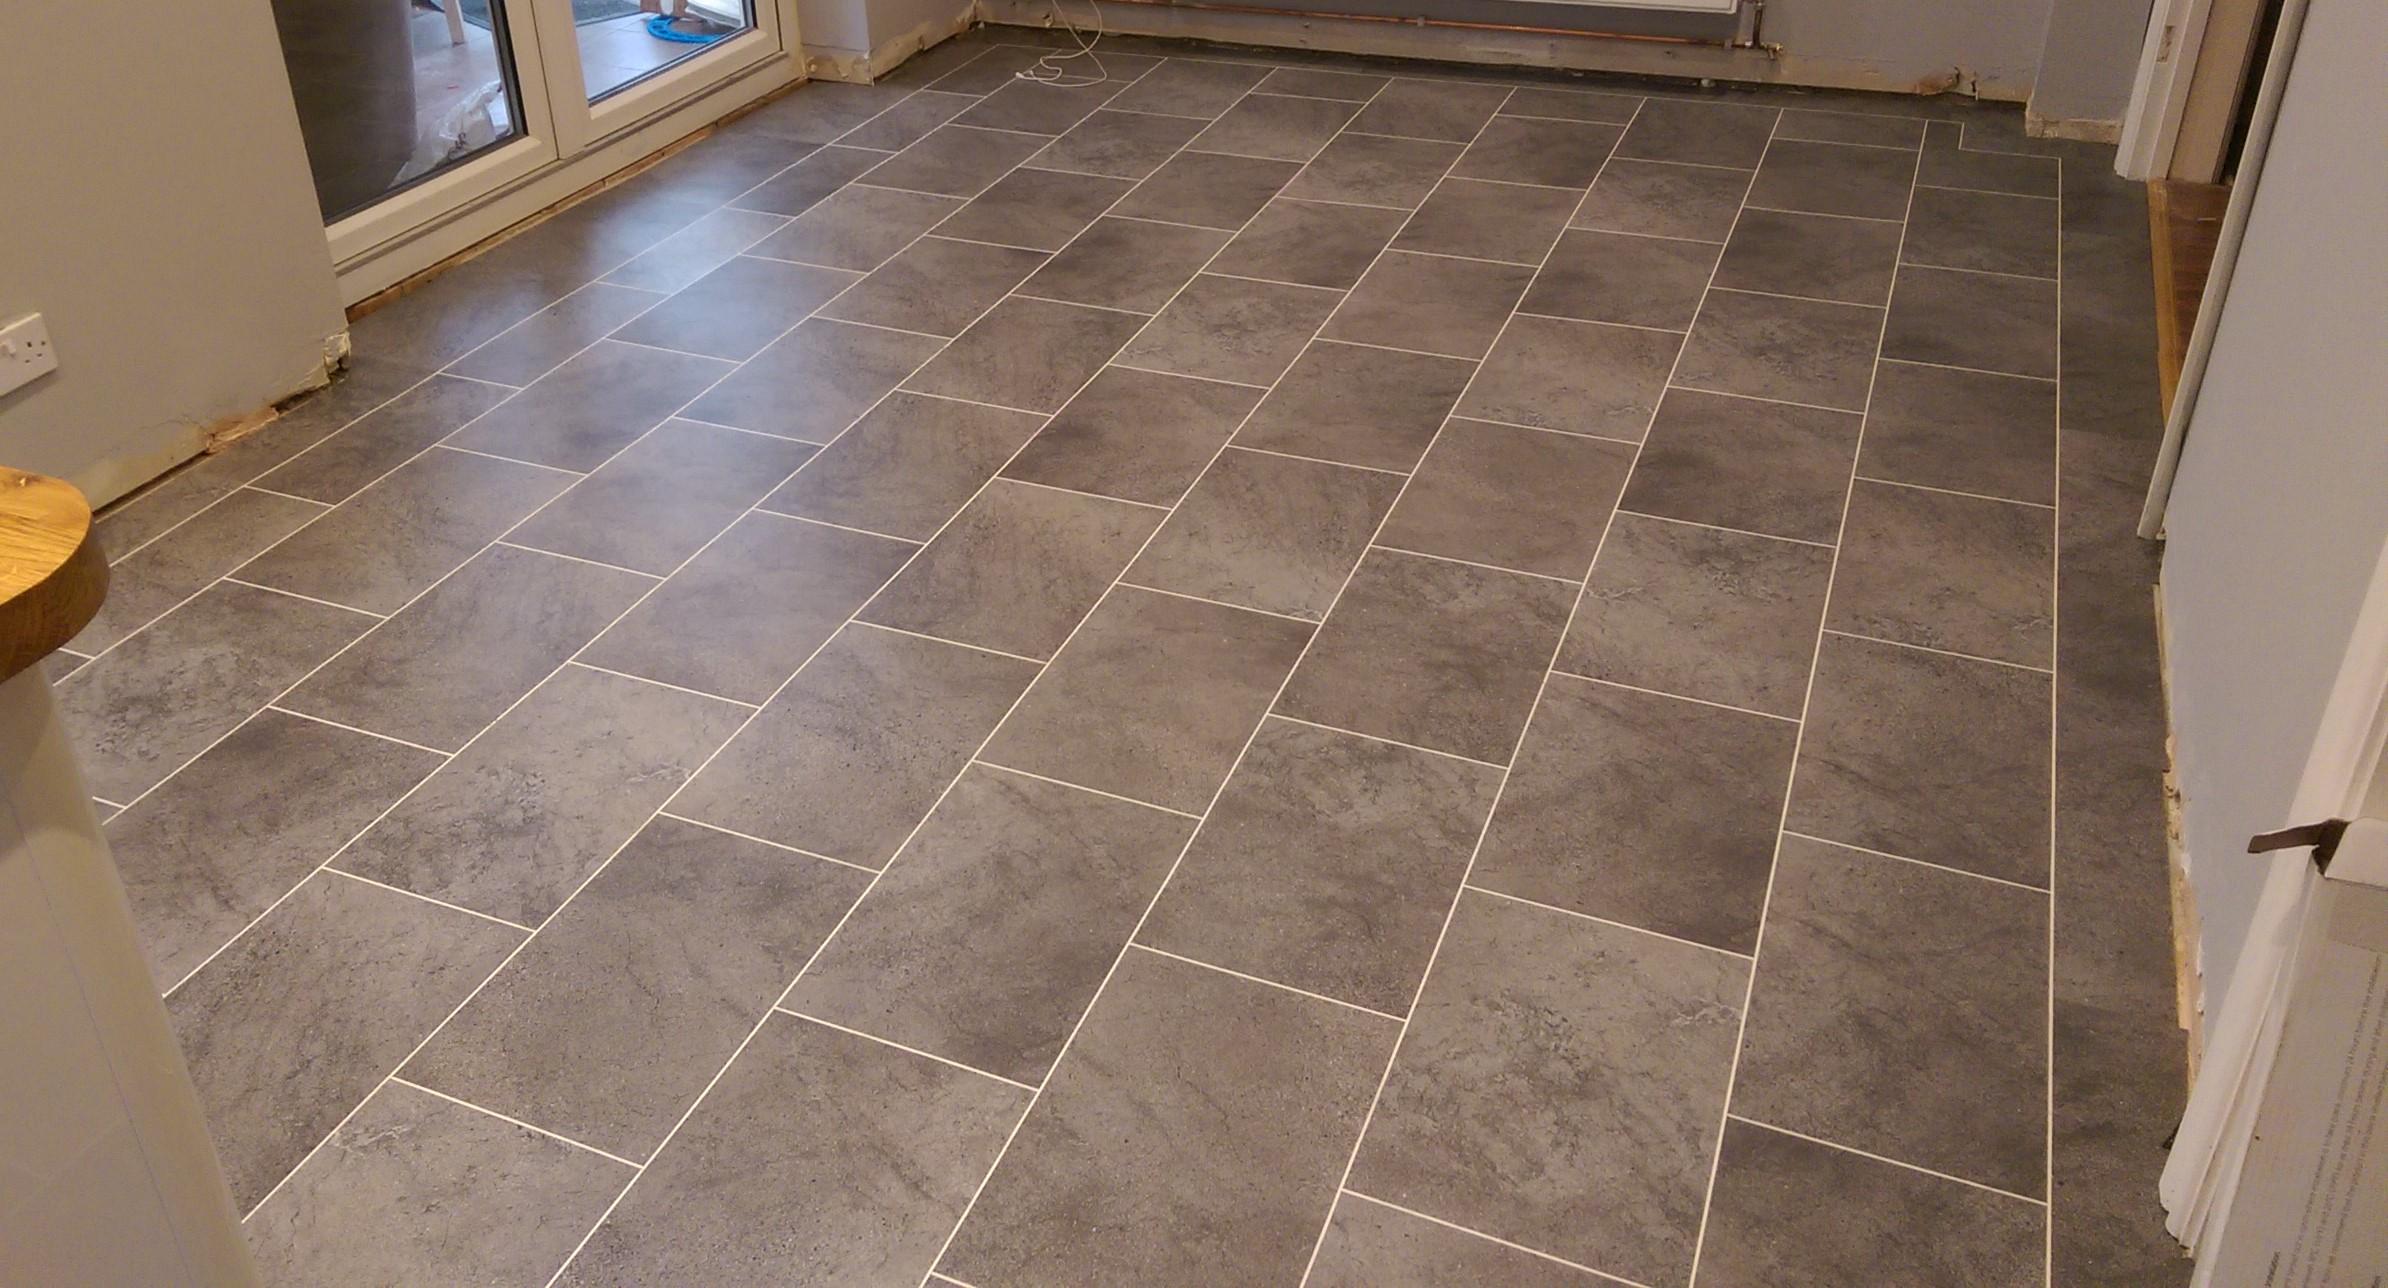 Karndean Knight Tile - Cumbrian Stone 3